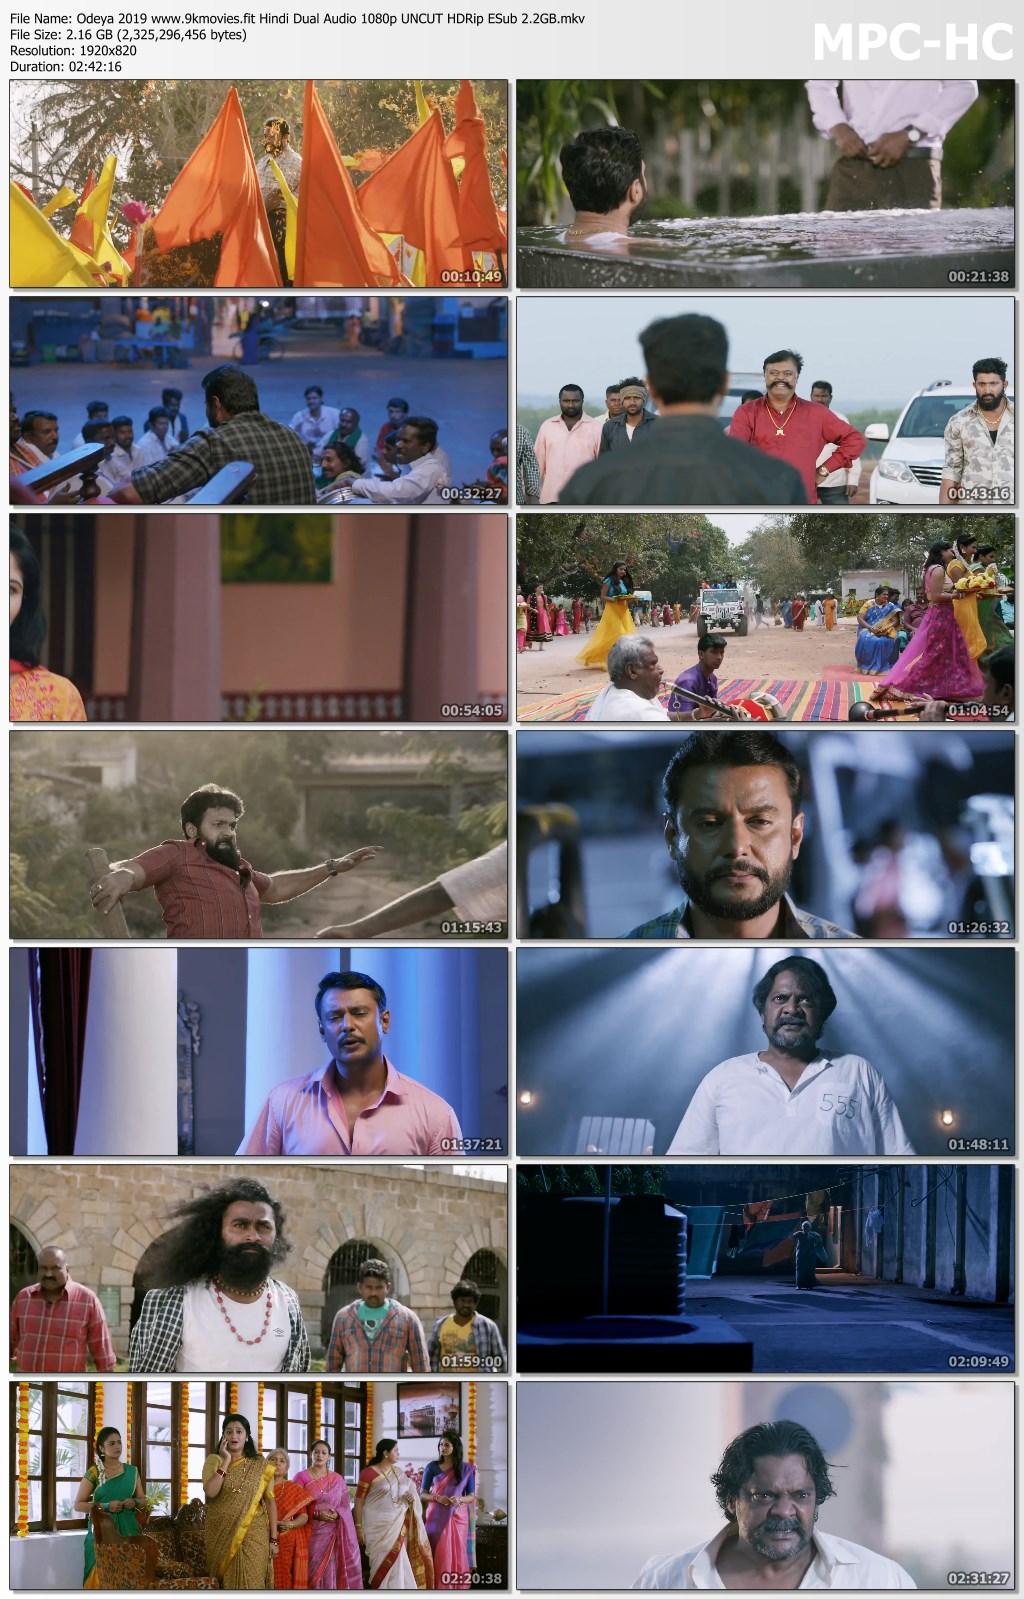 Download Odeya 2019 Hindi Dual Audio 720p UNCUT HDRip ESub 1.7GB